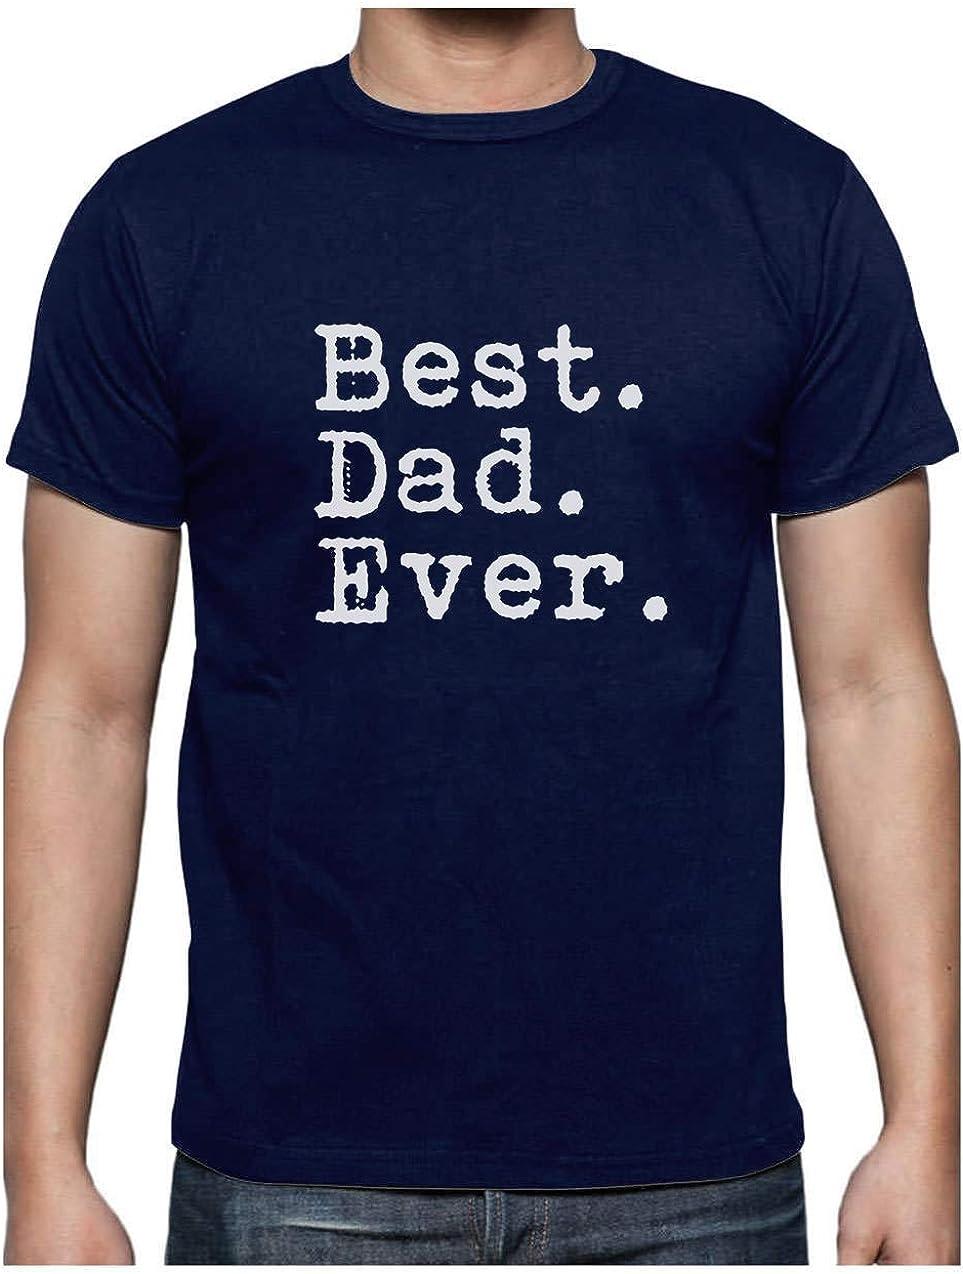 Green Turtle T-Shirts Camiseta para Hombre - Regalos para Hombre, Regalos para Padres. Camisetas Hombre Originales Divertidas - Best Dad Ever